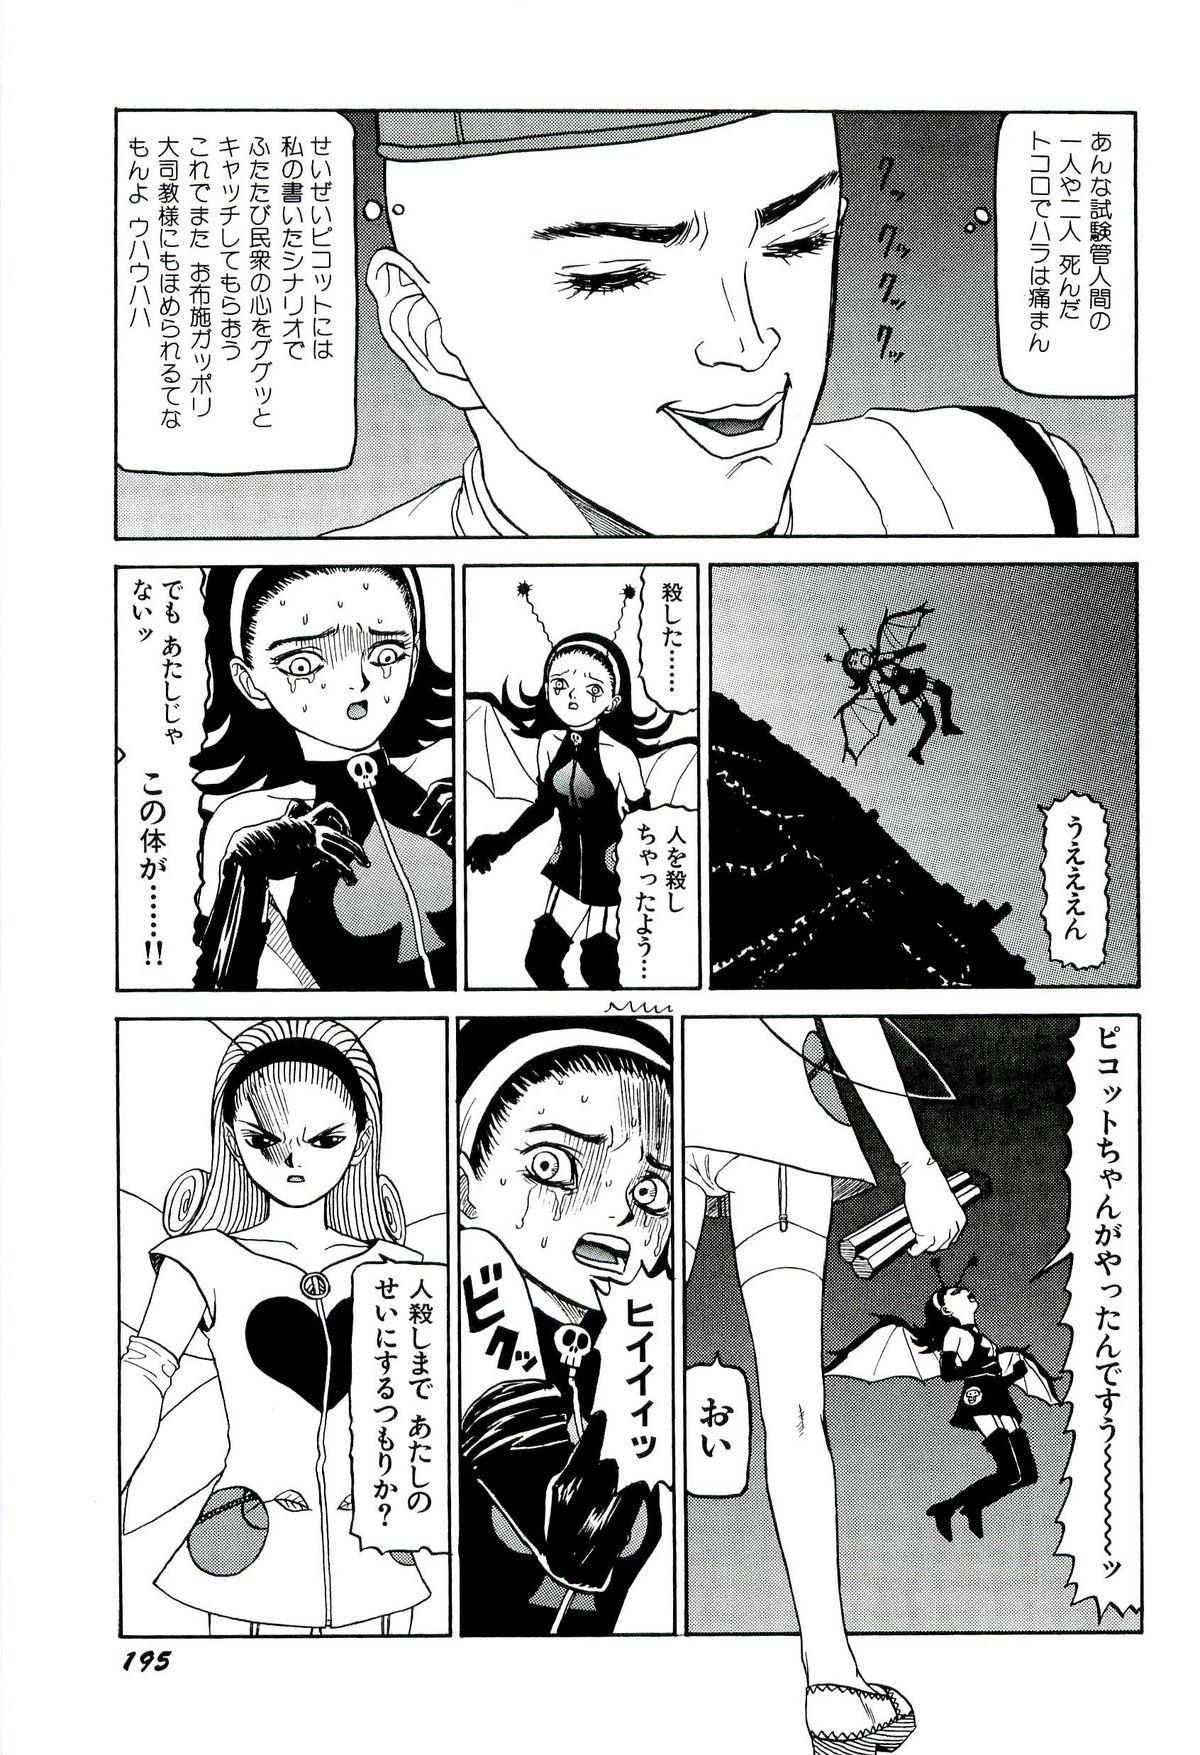 Jigokugumi no Onna 1 194